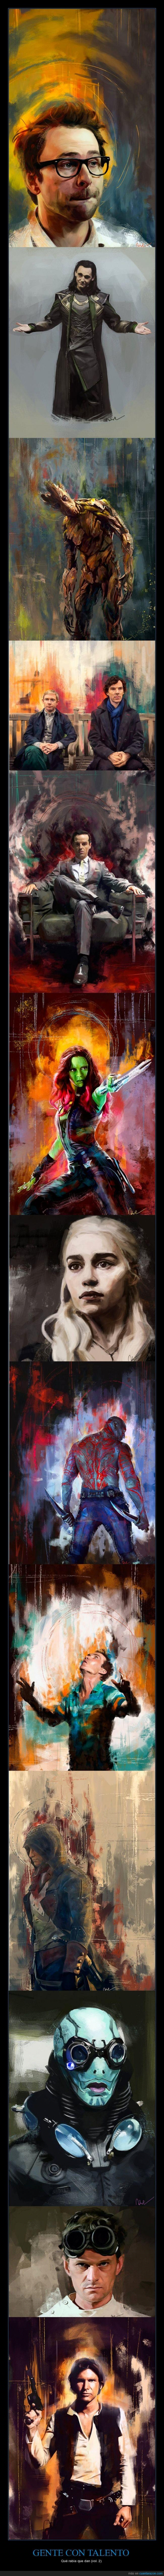 arte,assassin's creed,daenerys,dr. horrible,goot,guardianes de la galaxia,han solo,hellboy,loki,pintura,talento